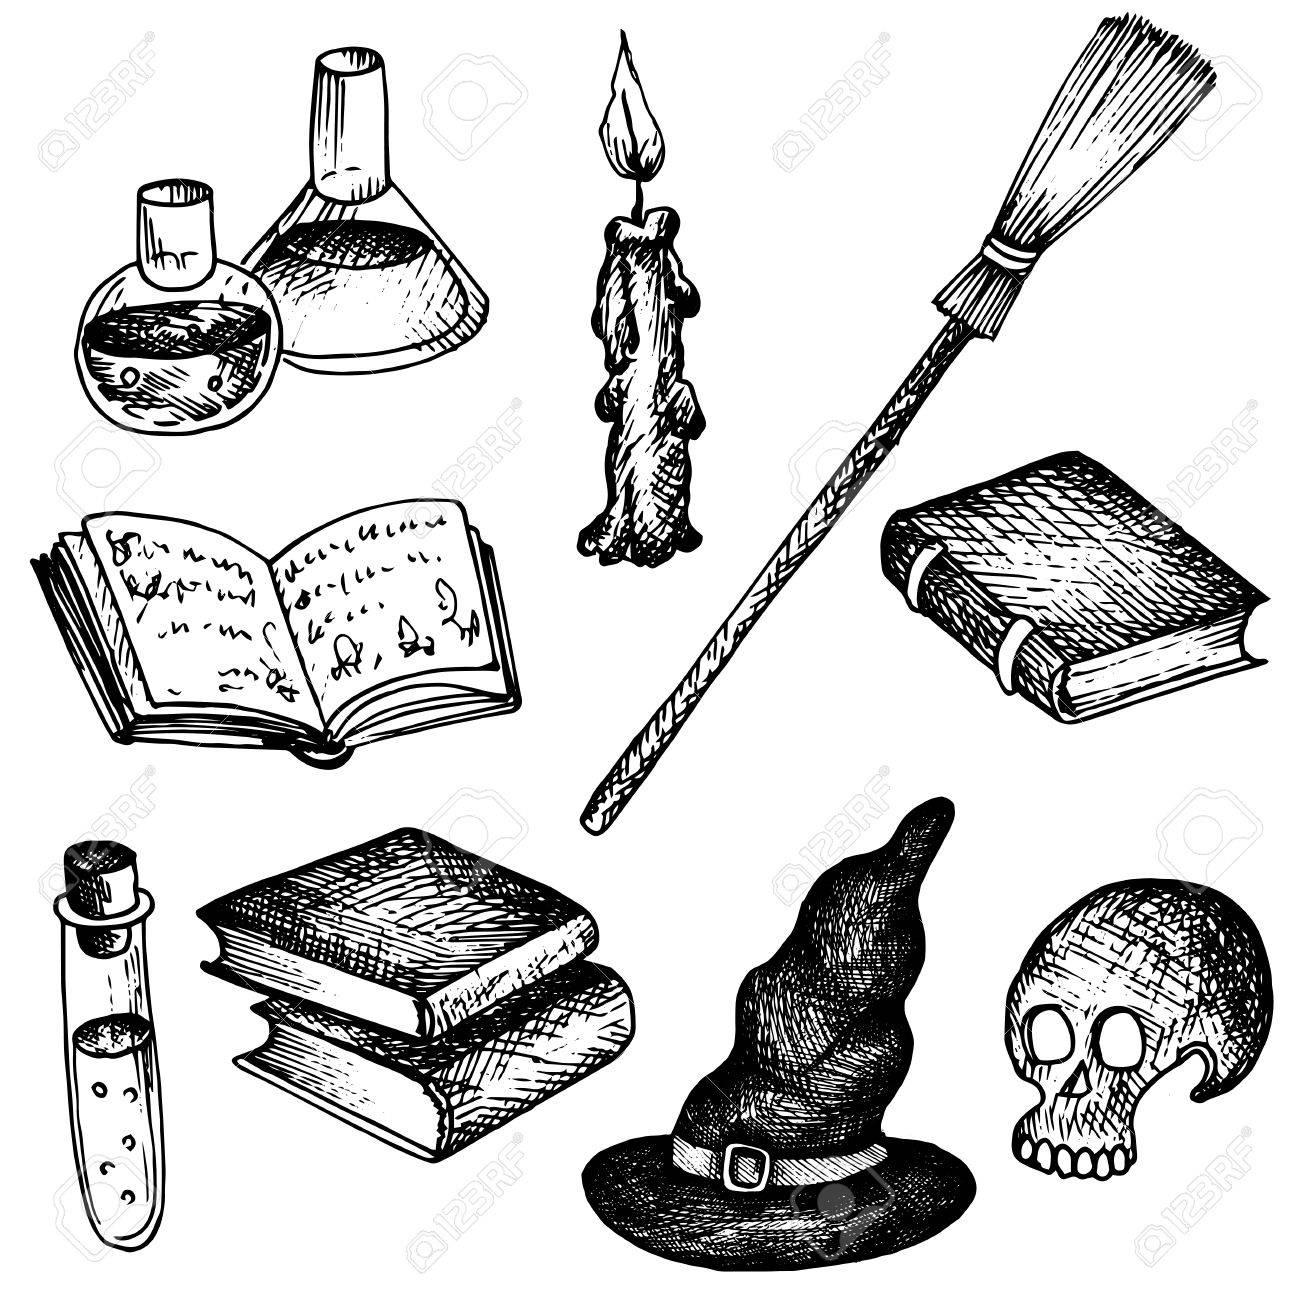 vector magic set, human skull and blakc hat, magician books and